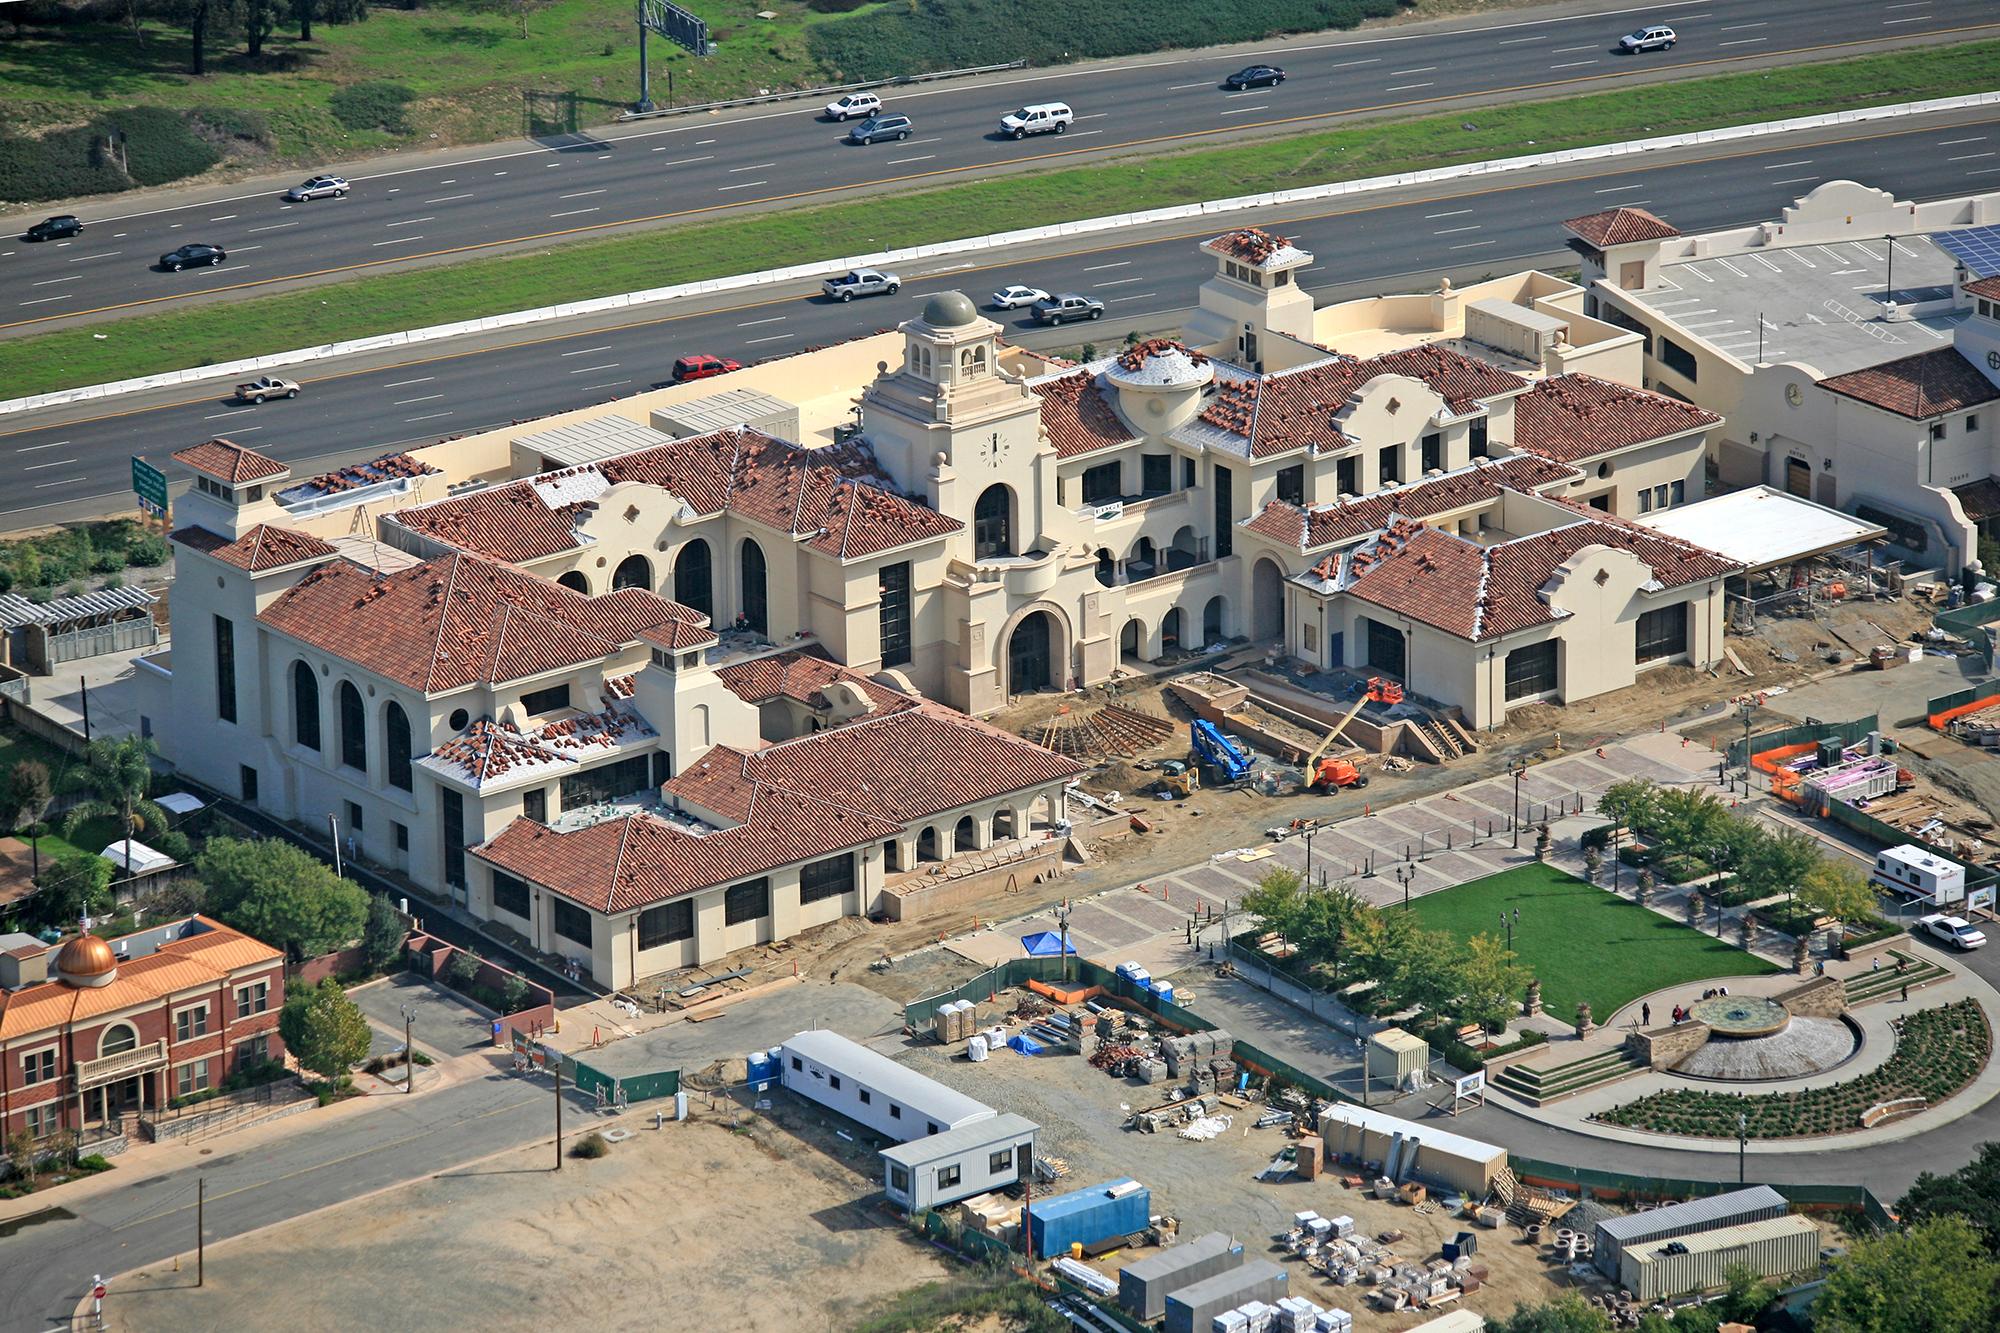 Temecula Civic Center